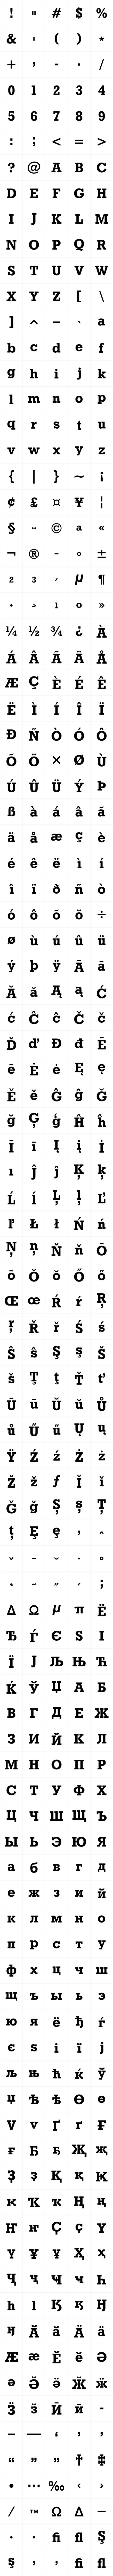 Geometric Slabserif